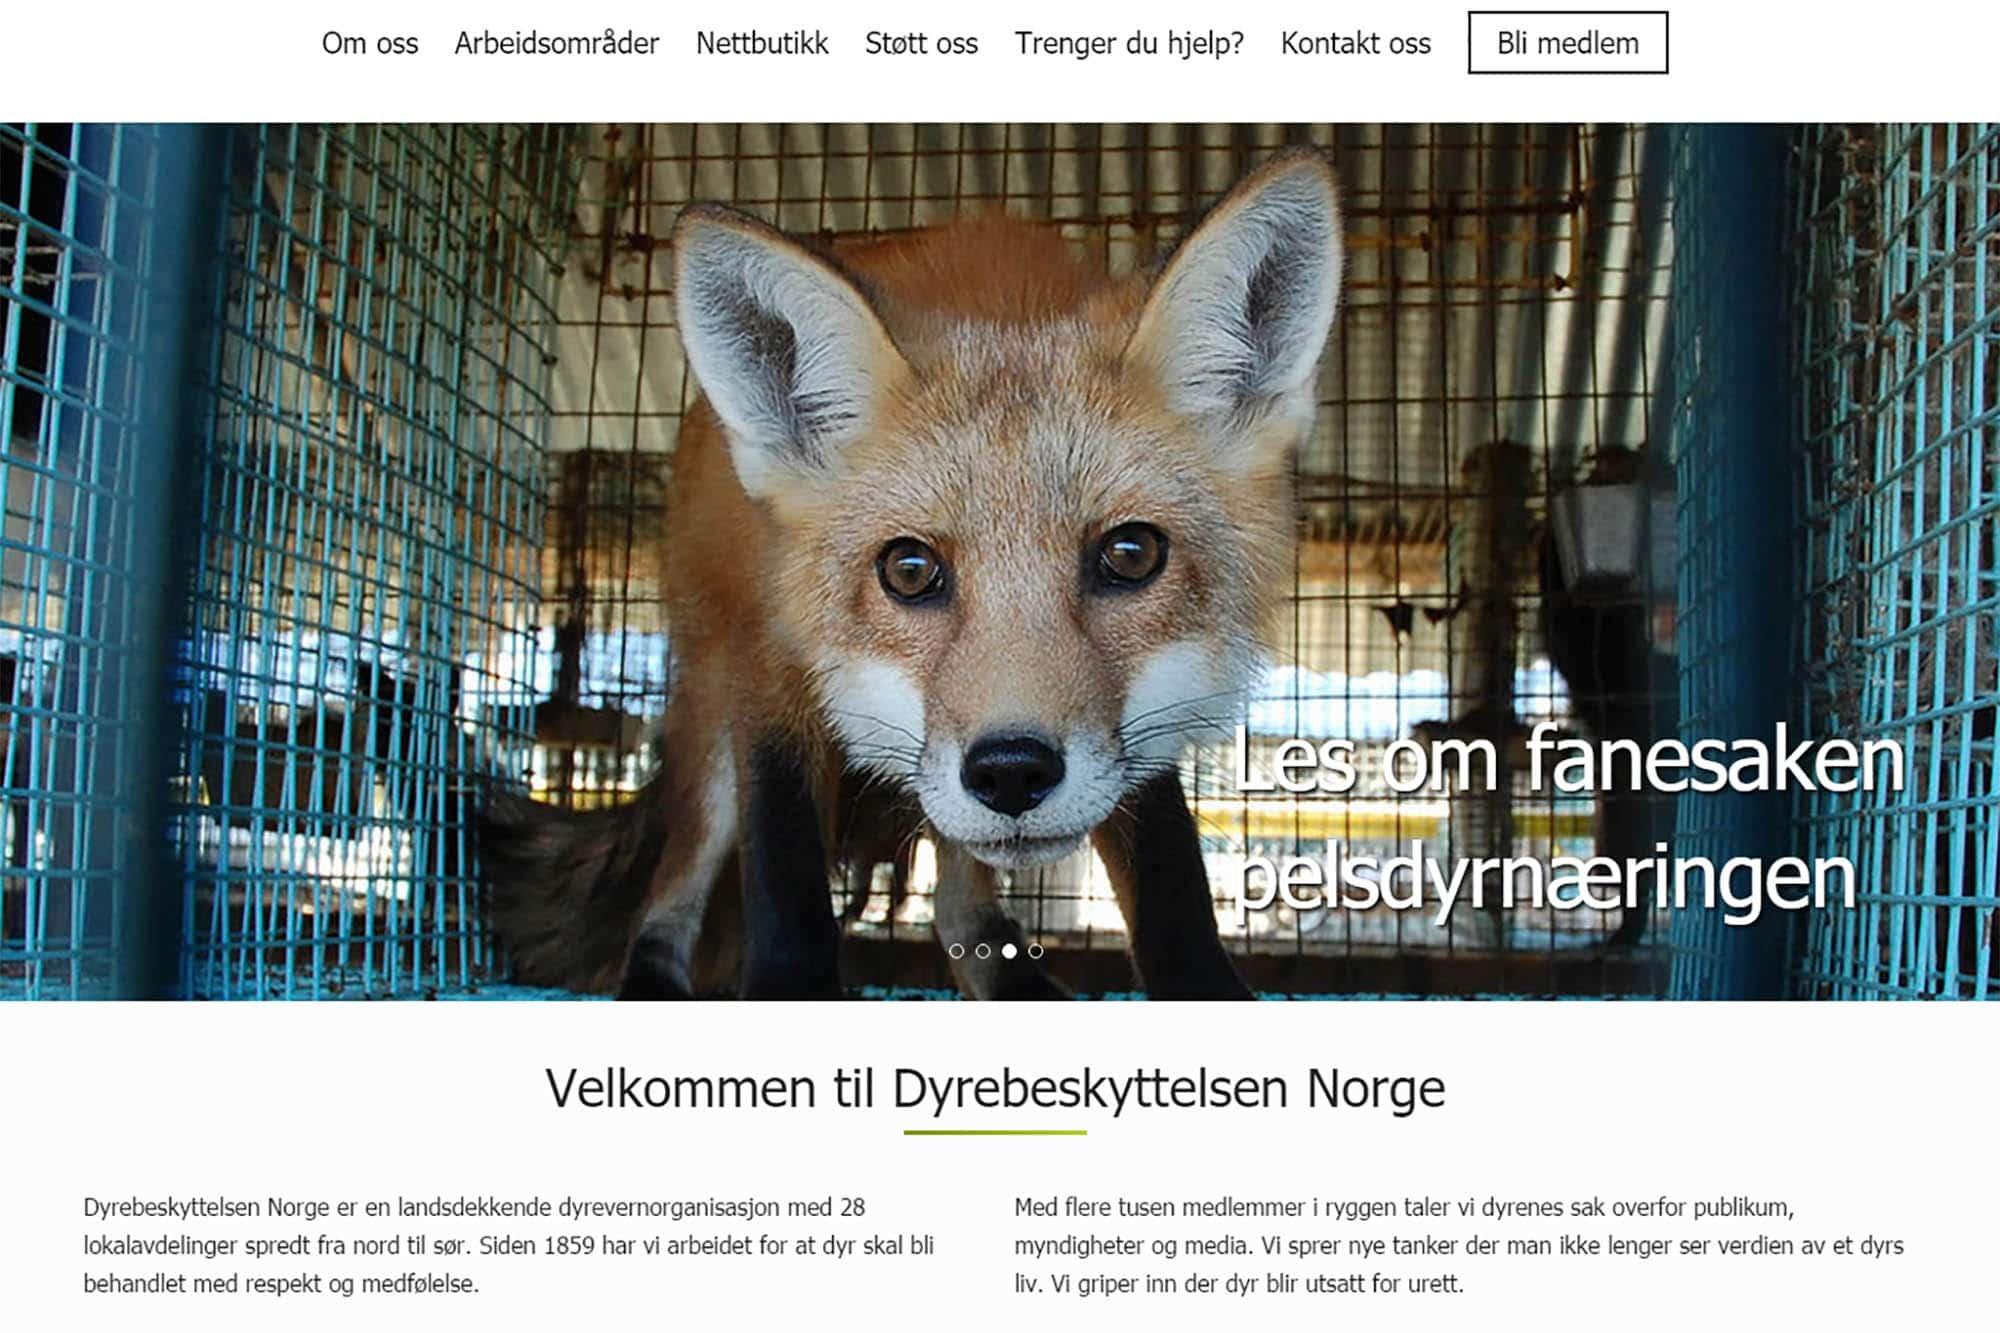 Dyrebeskyttelsen Norge nye sider